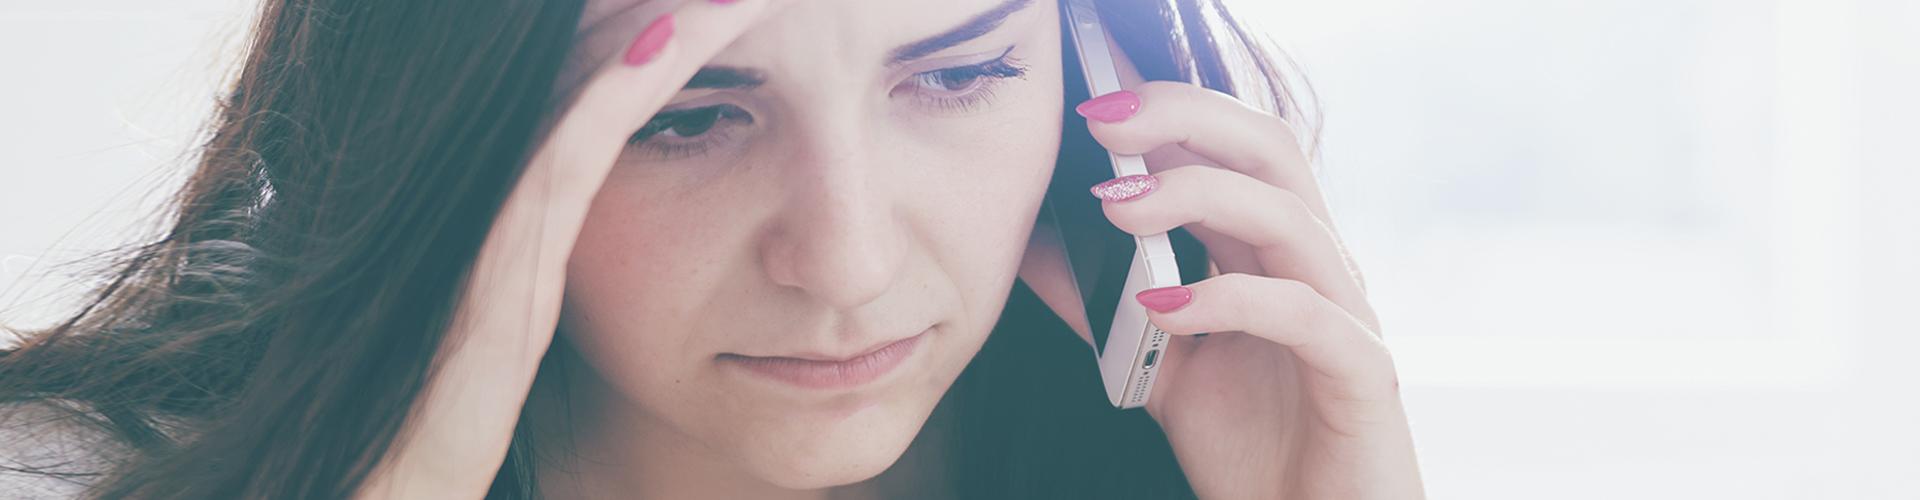 sad woman on phone